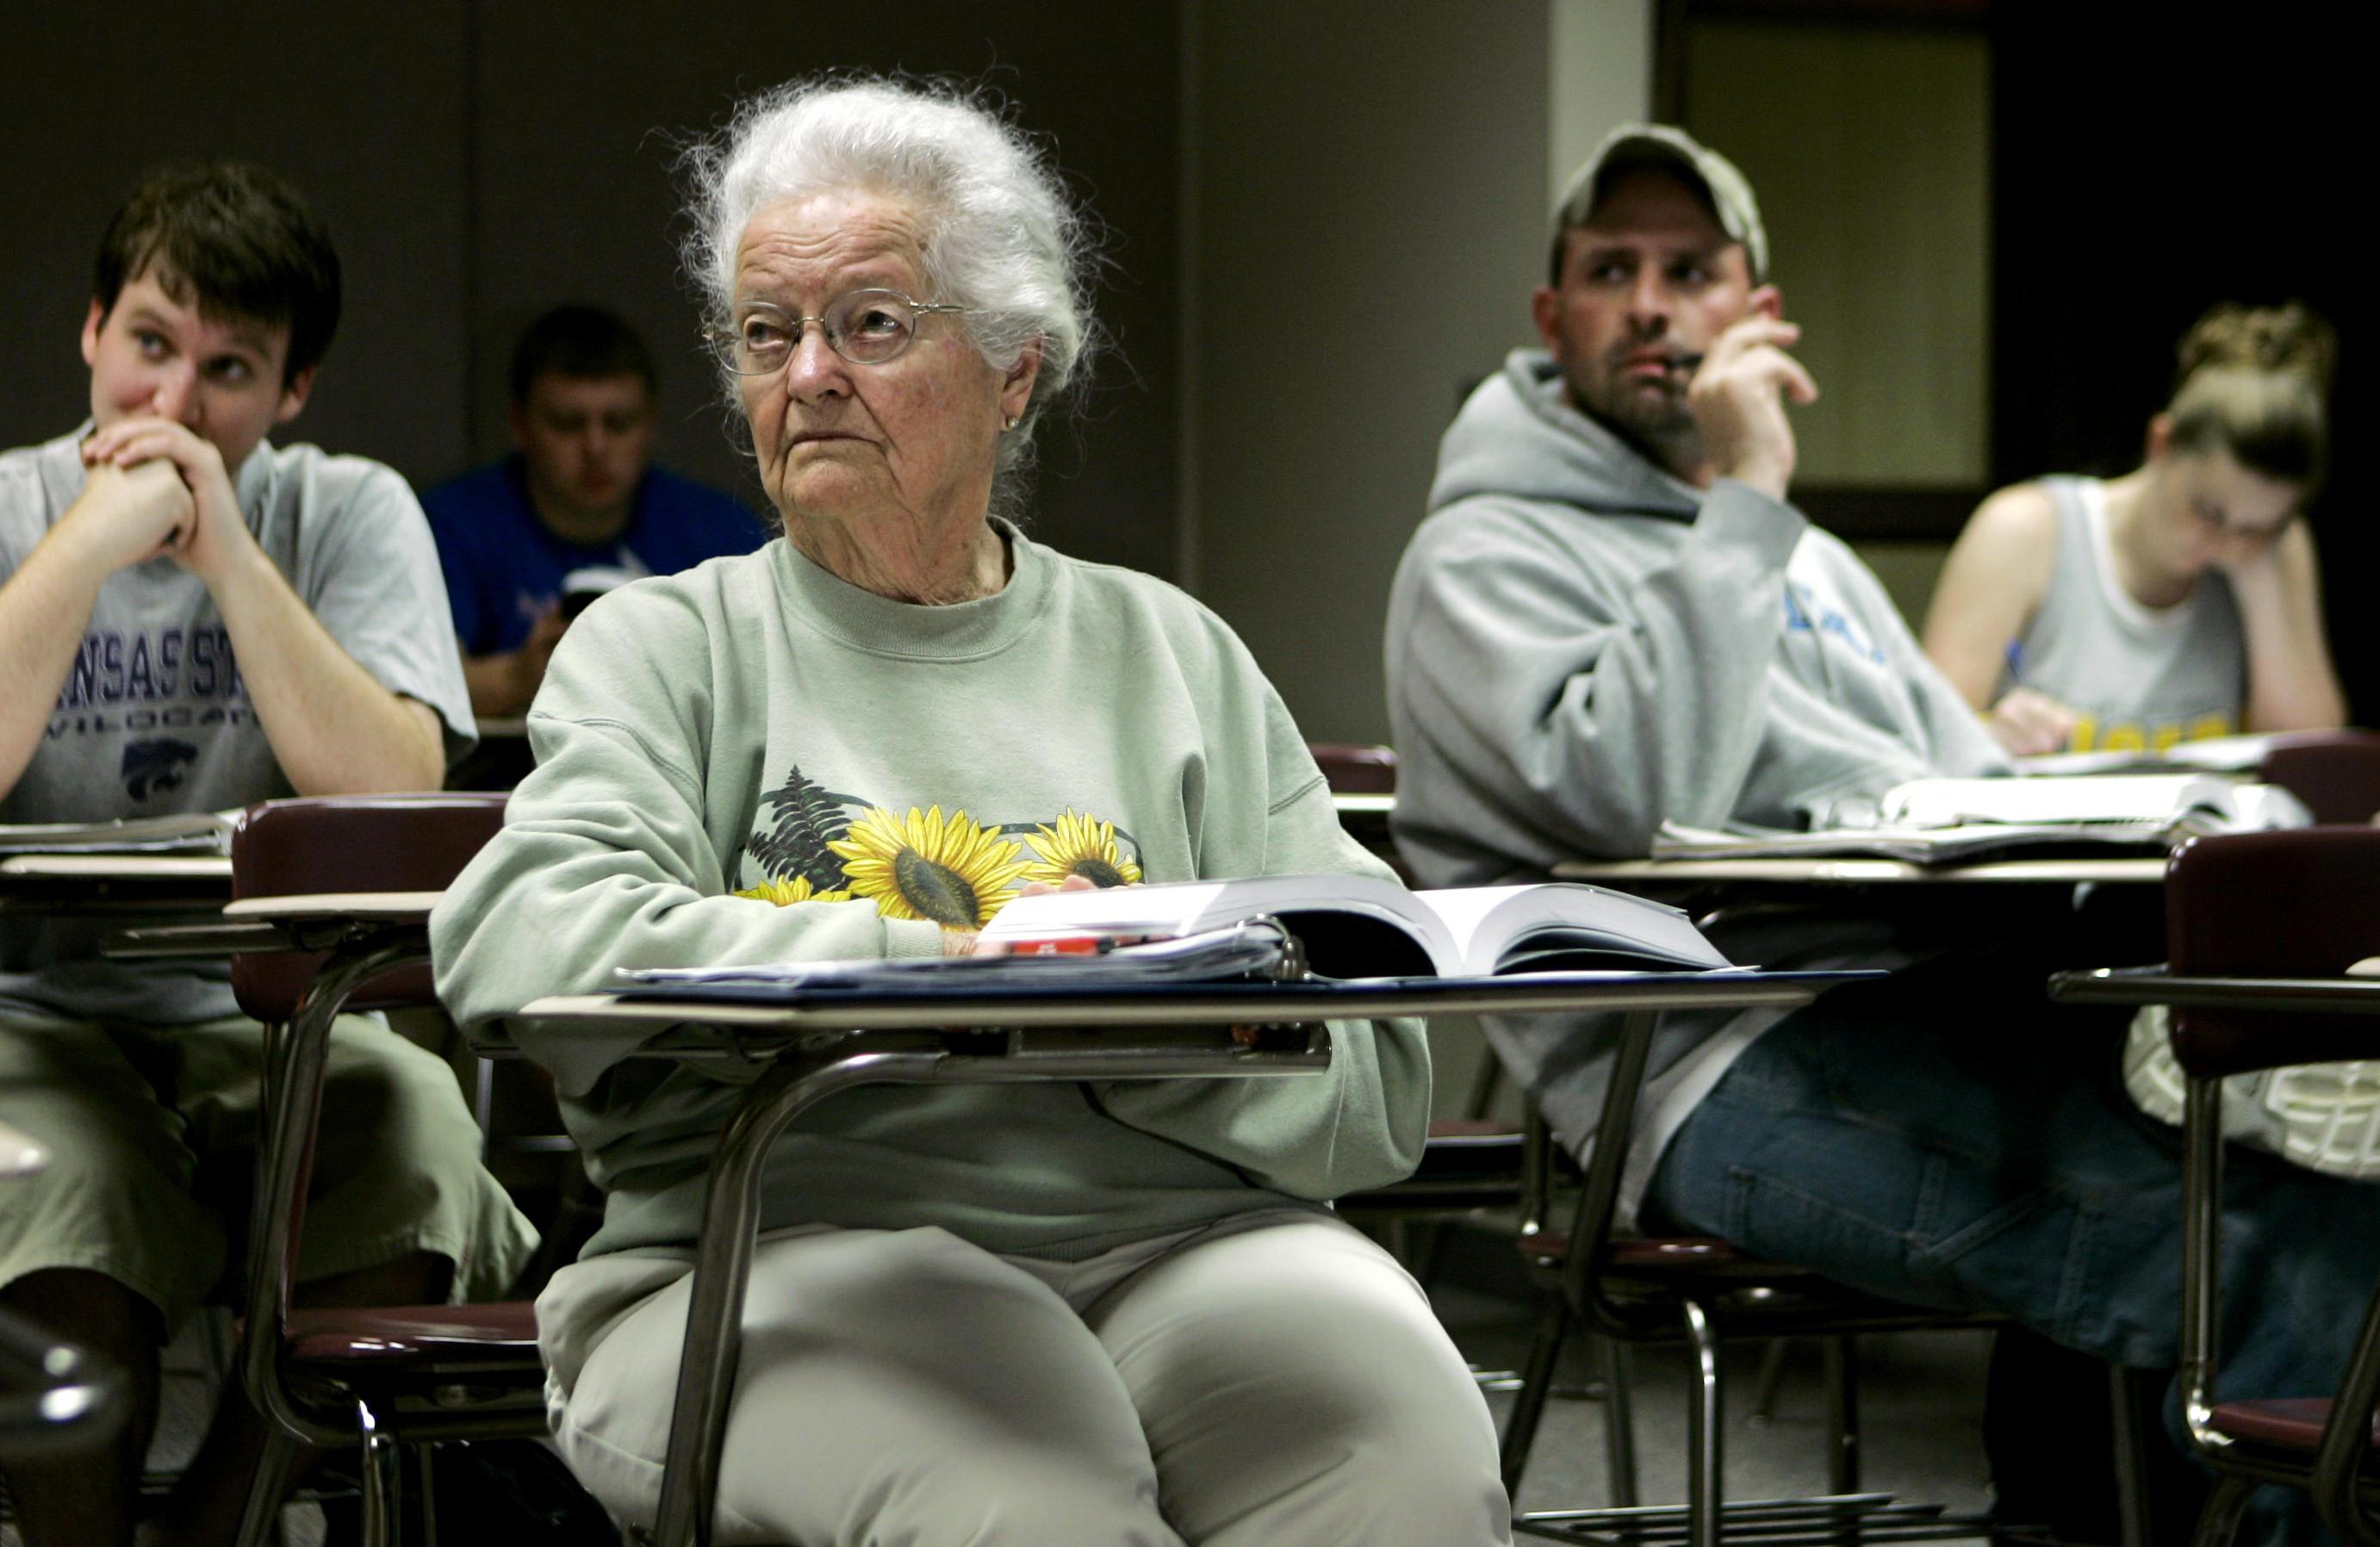 Nola Ochs, oldest woman to graduate college, dead at 105